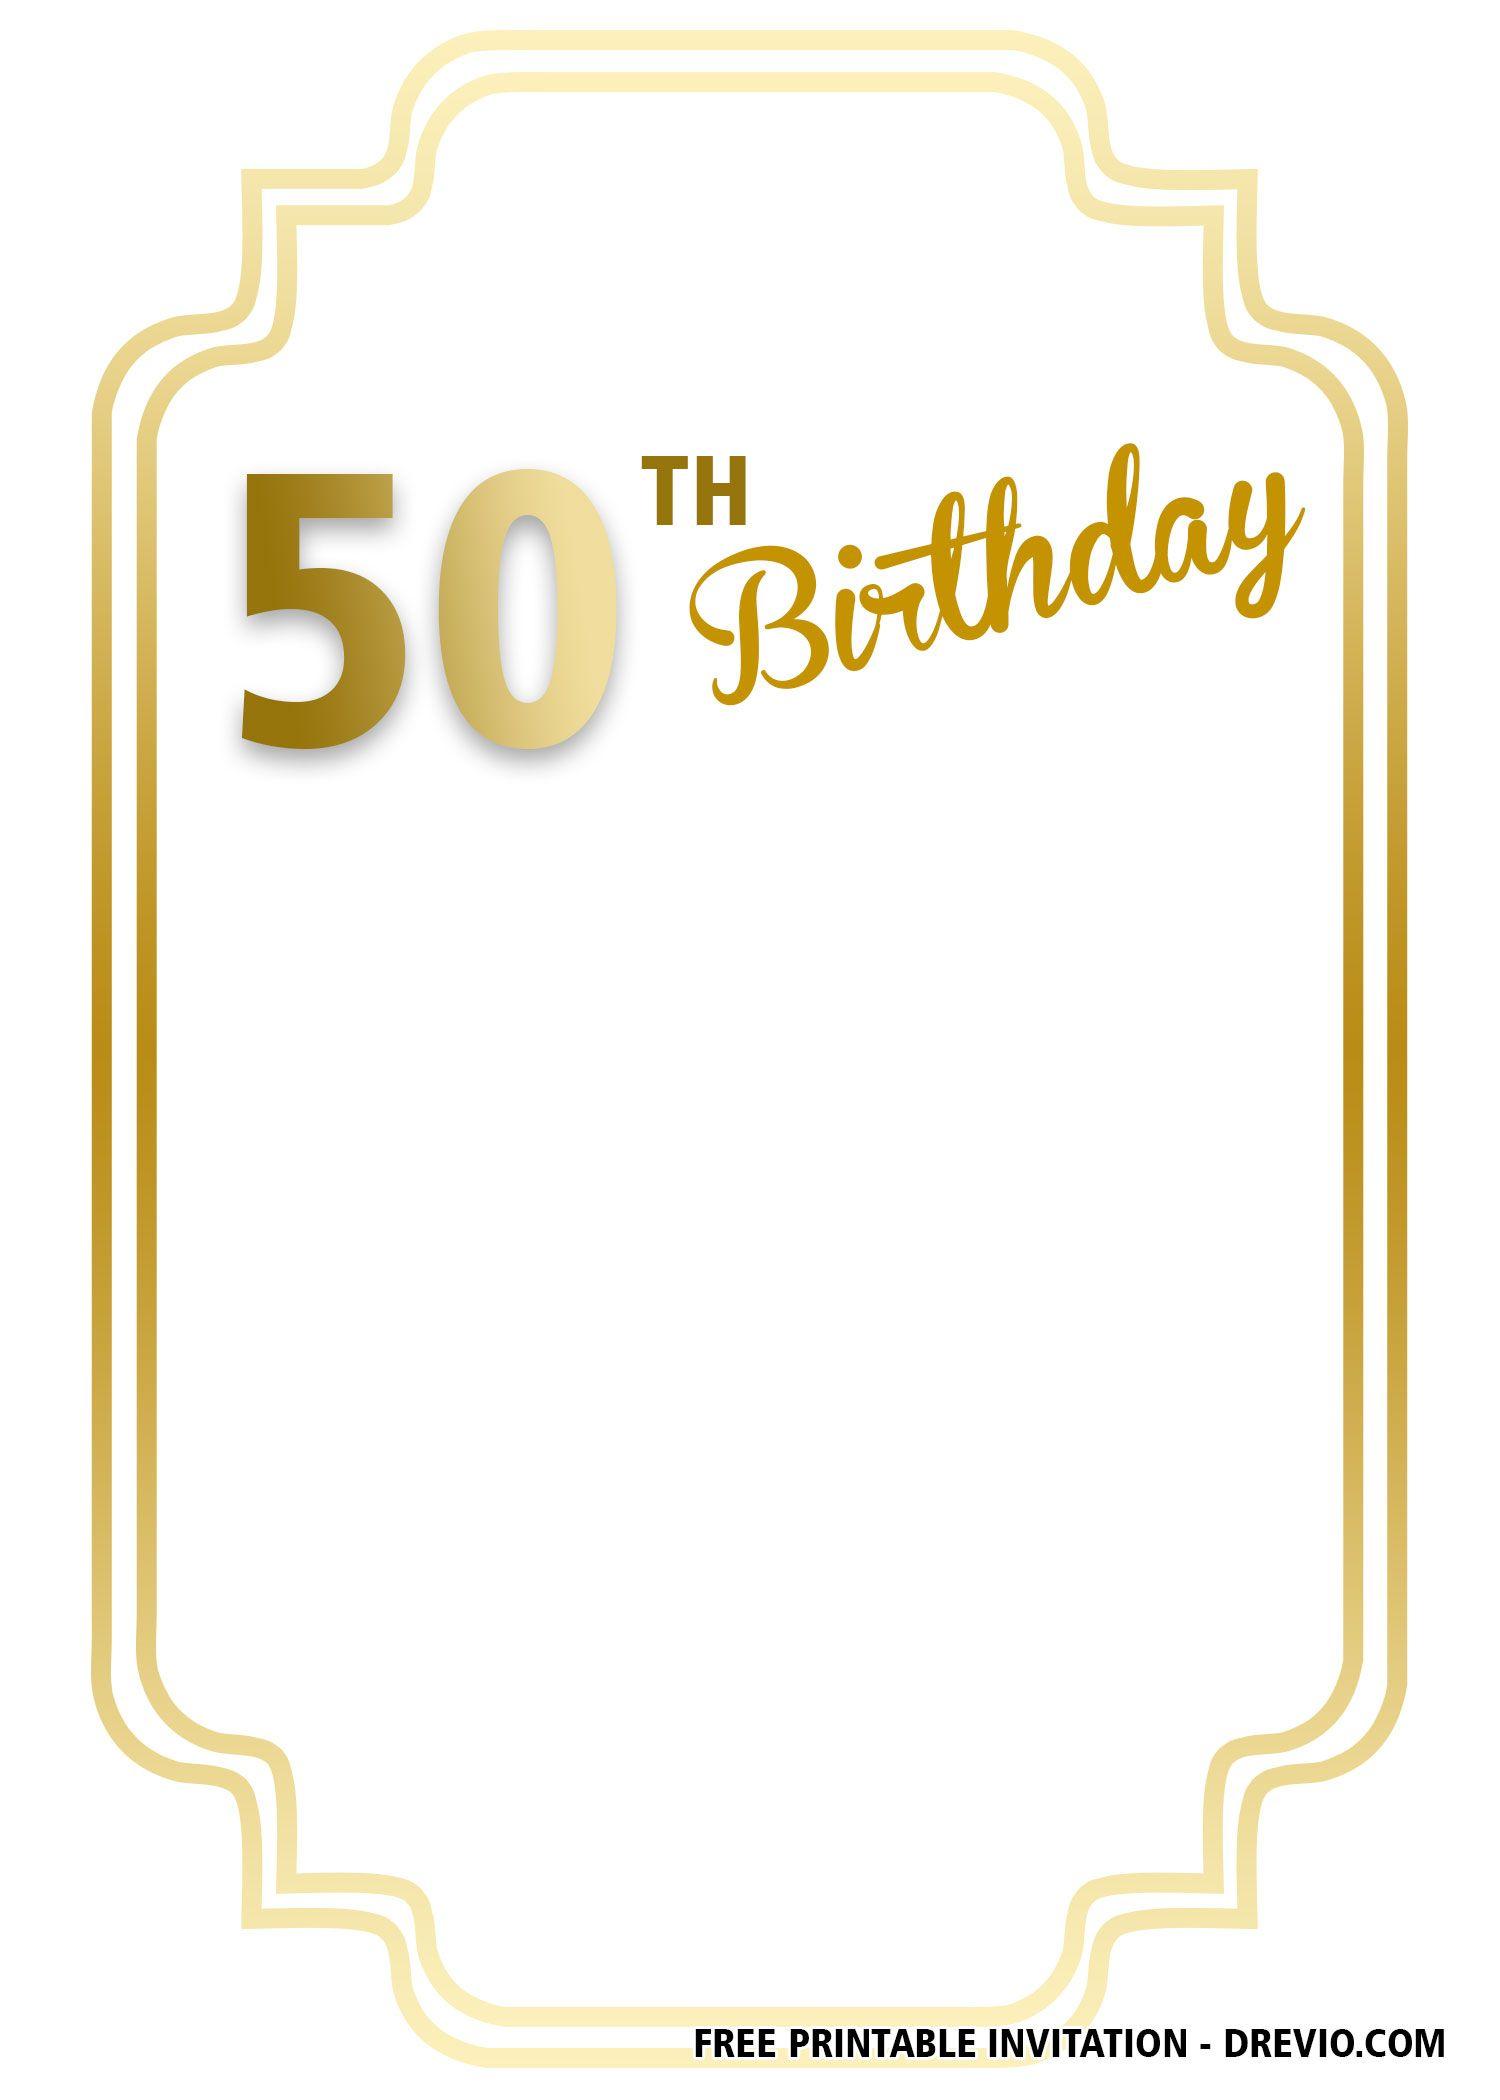 FREE Printable 90th Birthday Invitation Templates.